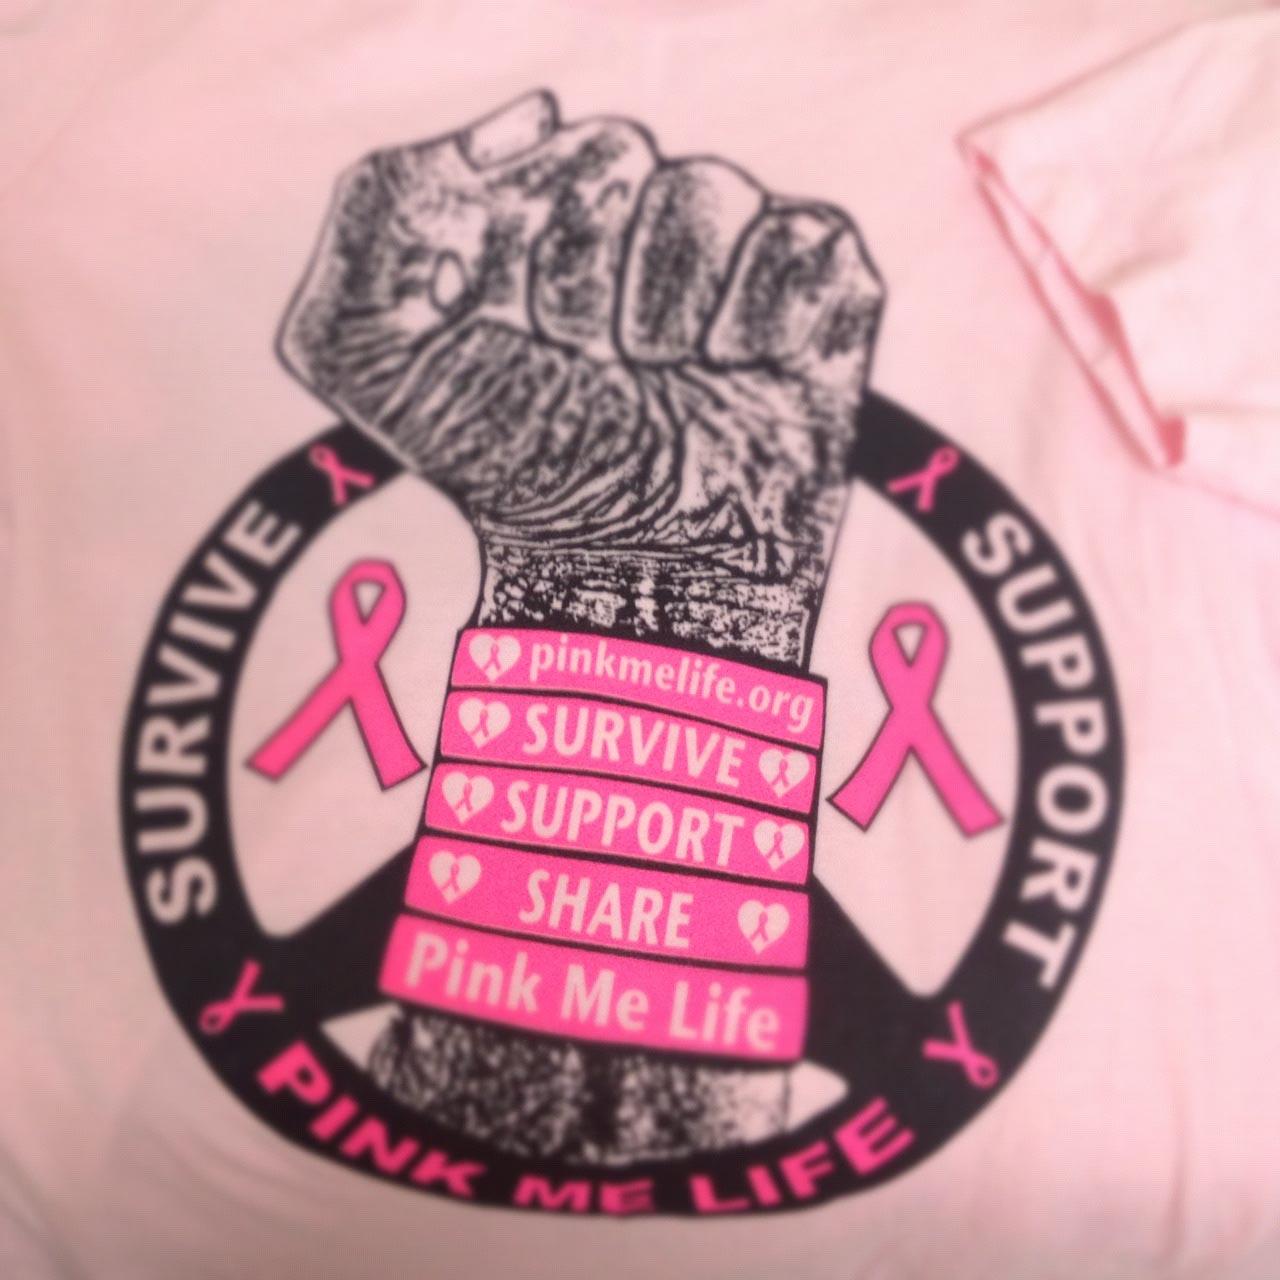 Survive, Support